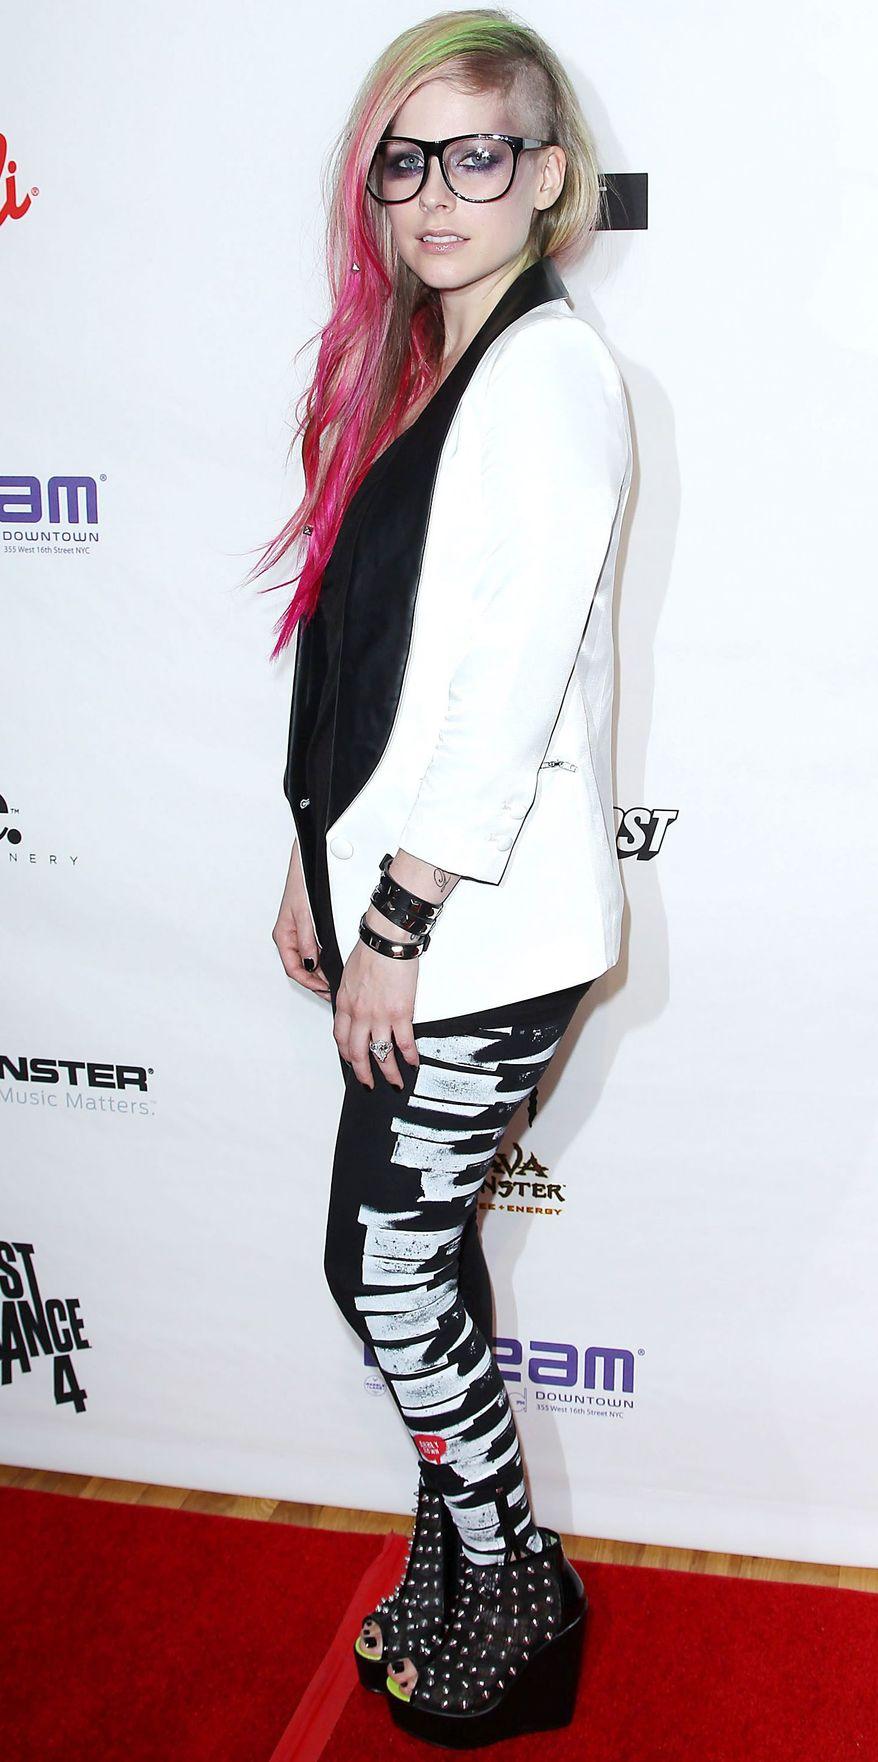 Pop star Avril Lavigne promises she will wear a wedding dress that she might make herself when she marries her fiance, rocker Chad Kroeger. (Associated Press)